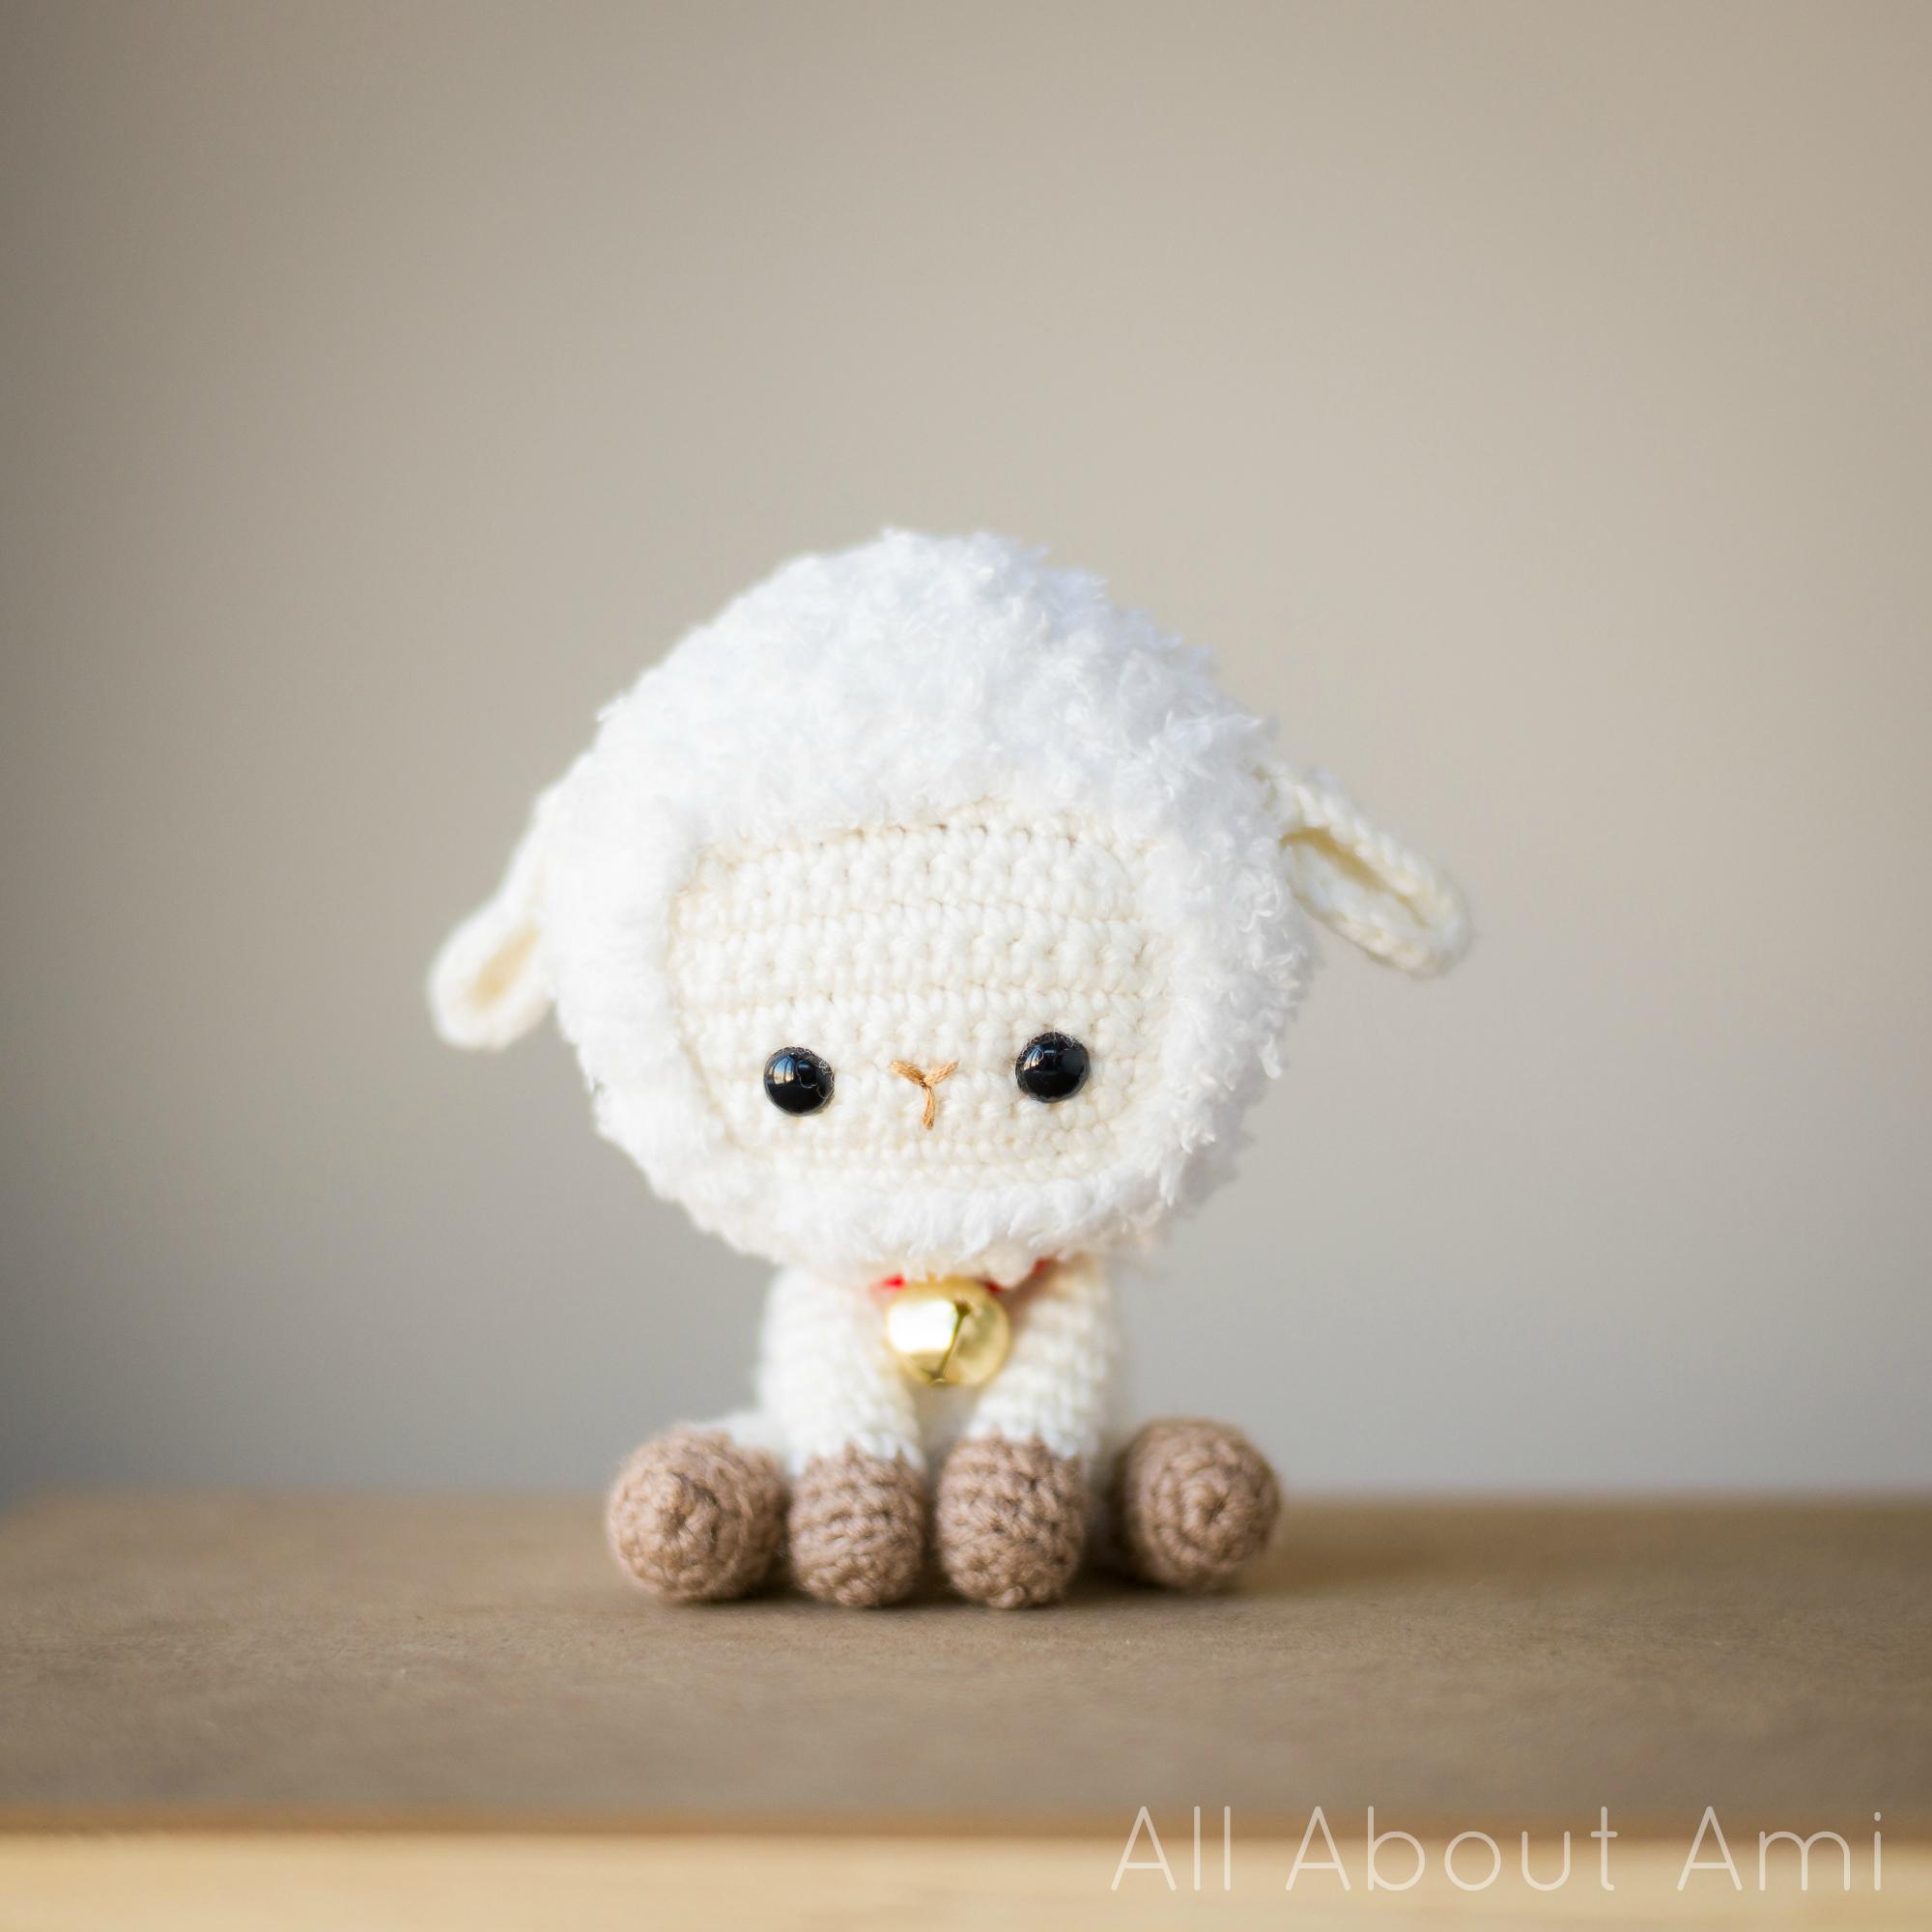 Pattern: Chinese New Year Sheep/Lamb - All About Ami